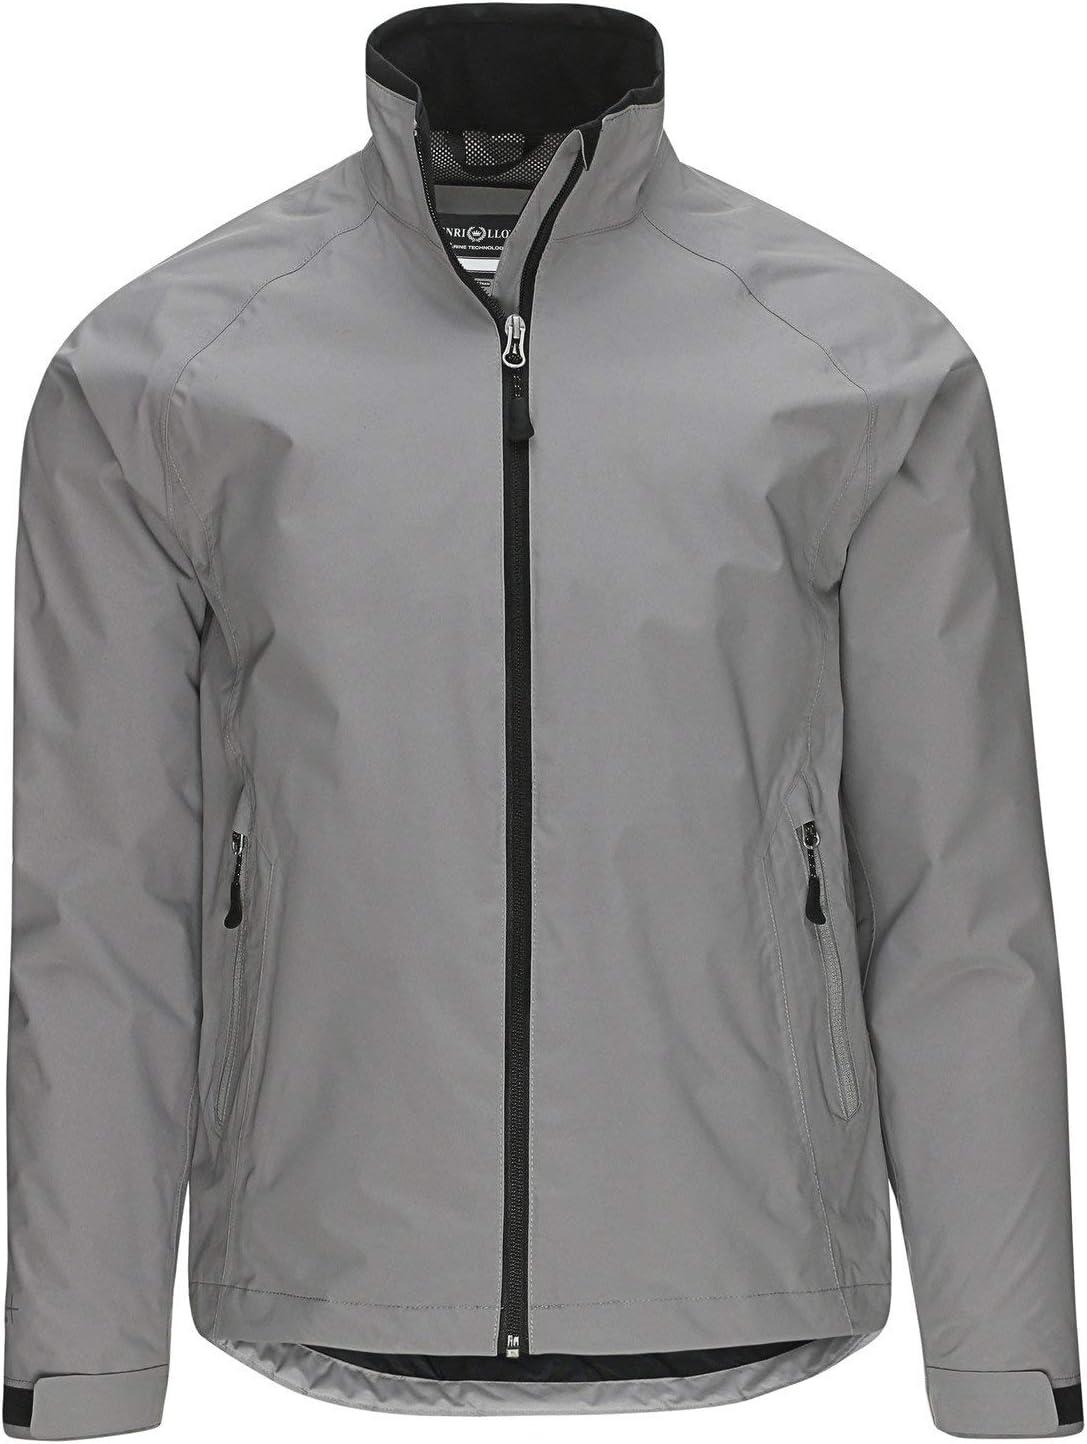 Lightweight Henri Lloyd Breeze Inshore Sailing /& Yachting Coat Jacket Coat Titanium Waterproof /& Breathable